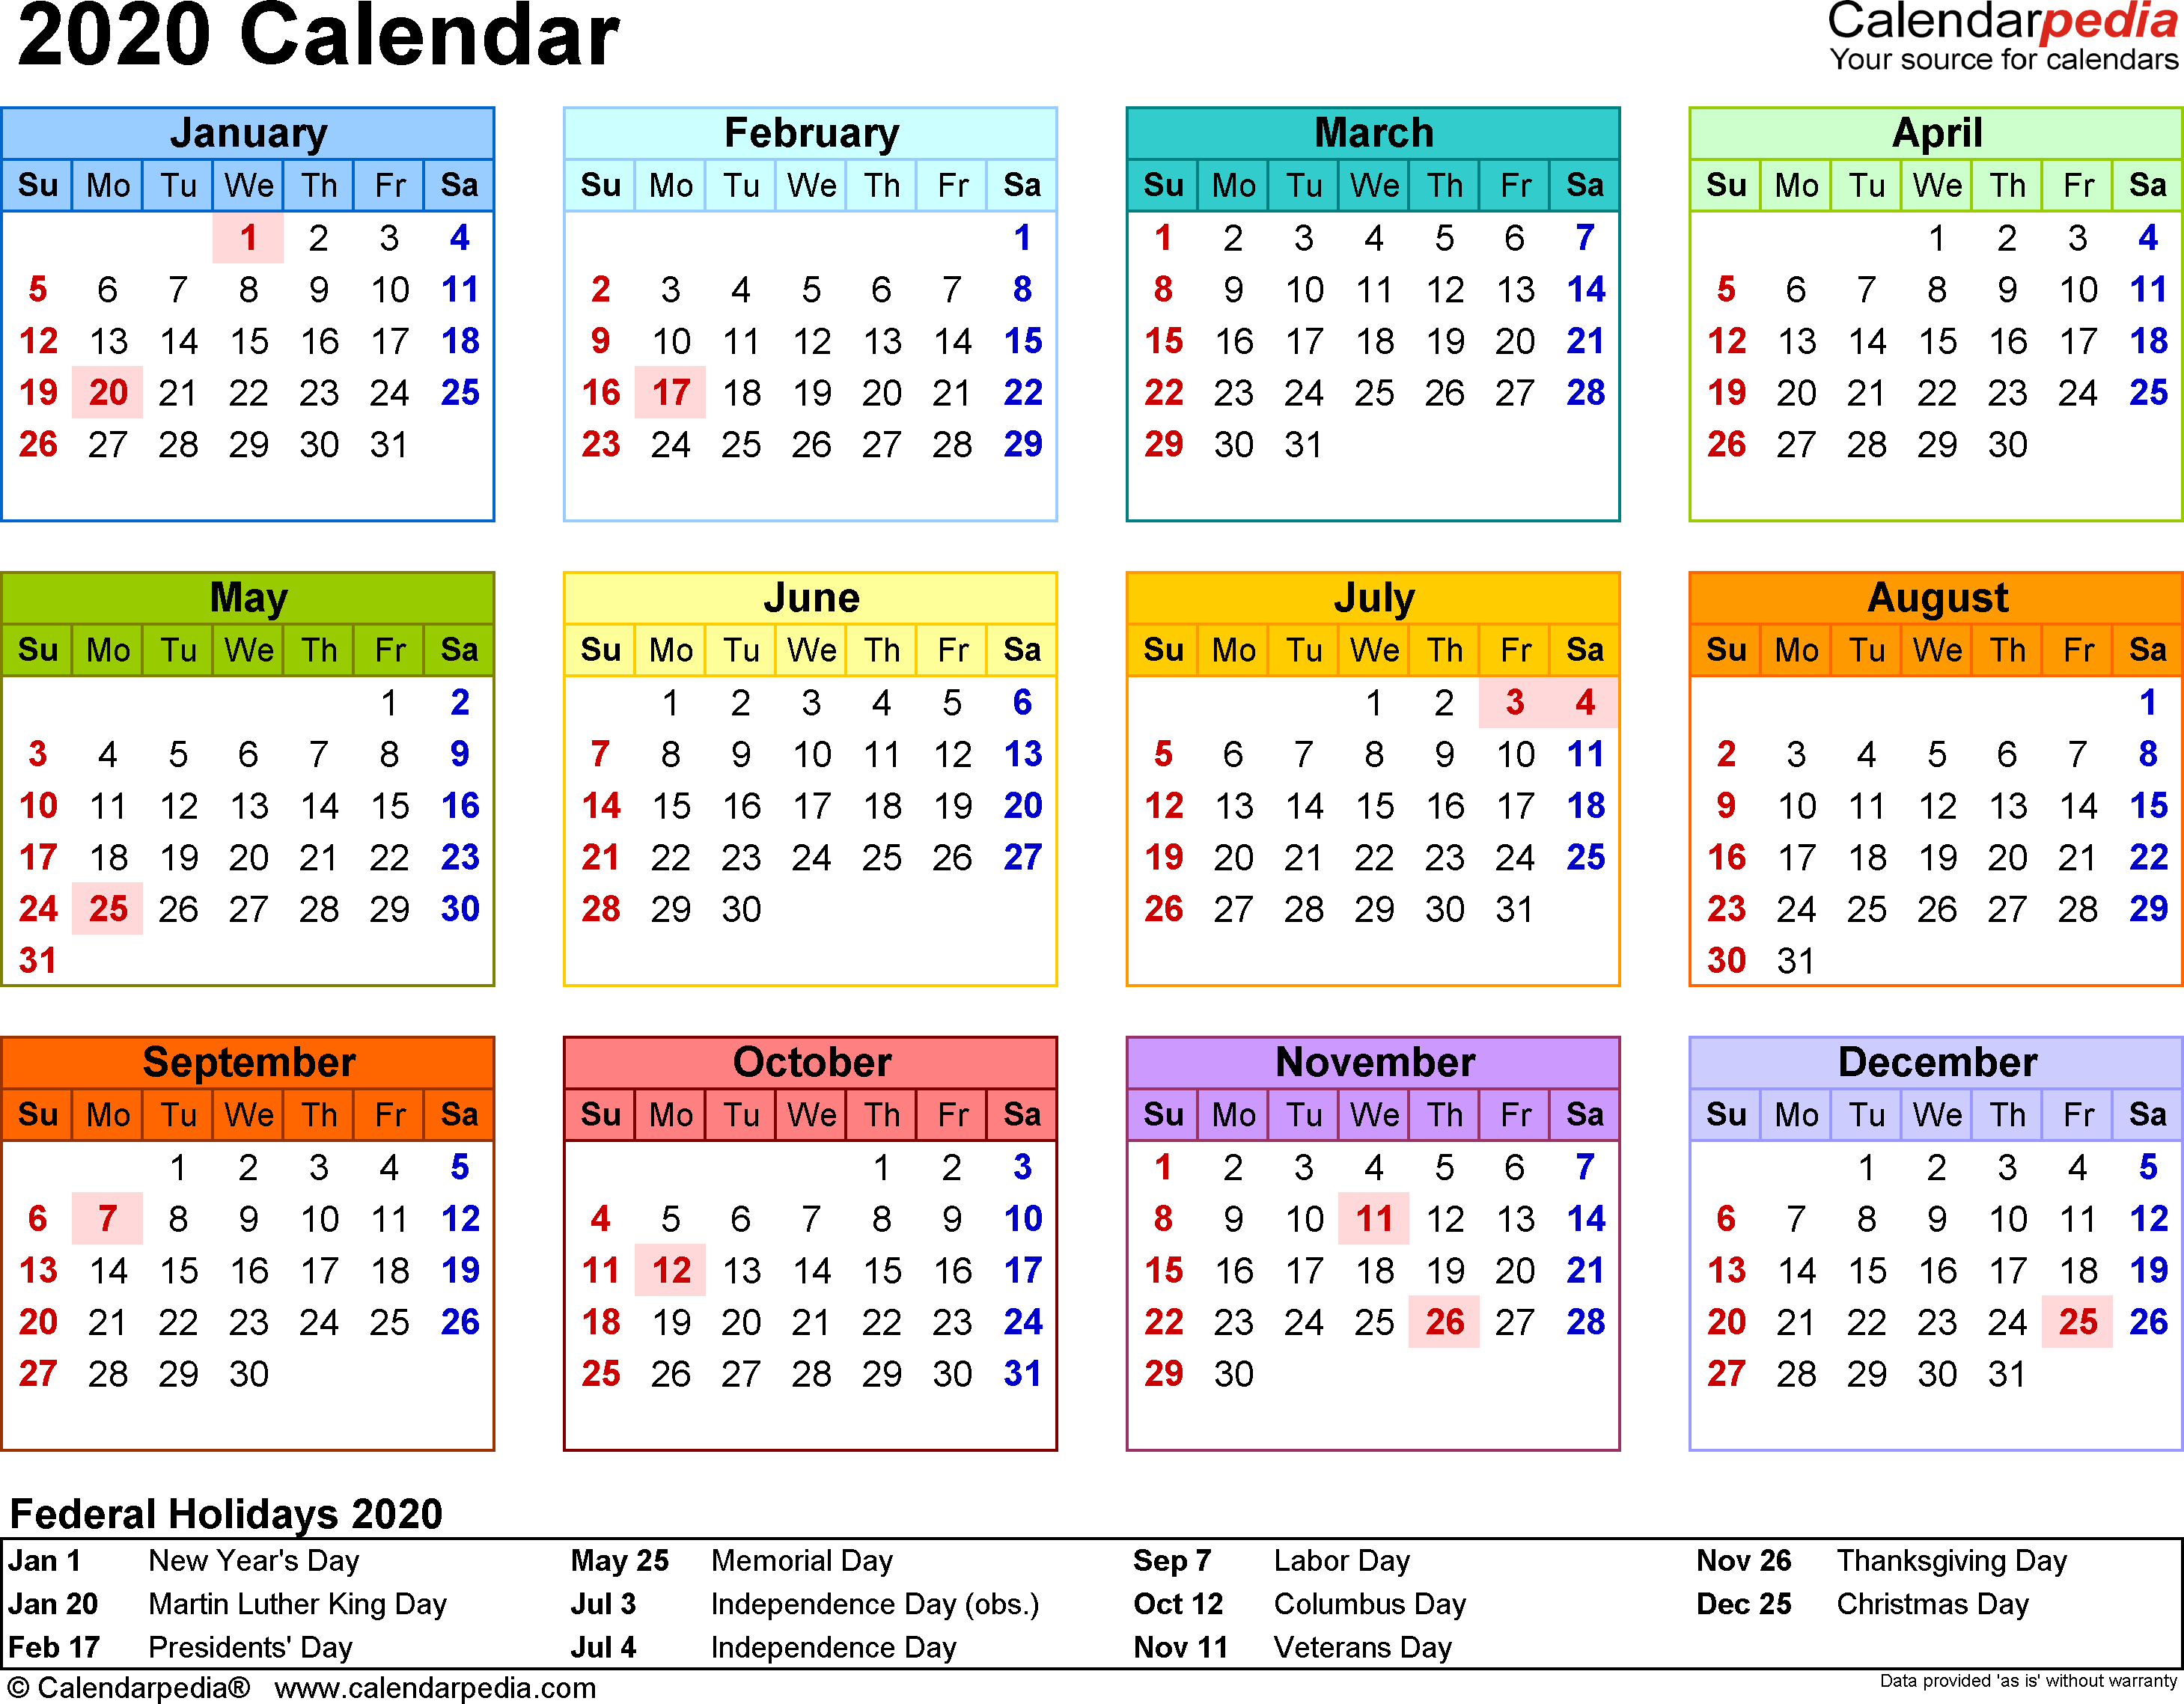 2020 Calendar - Download 17 Free Printable Excel Templates (.xlsx) with 2020 Vertex Calendars Printable Free